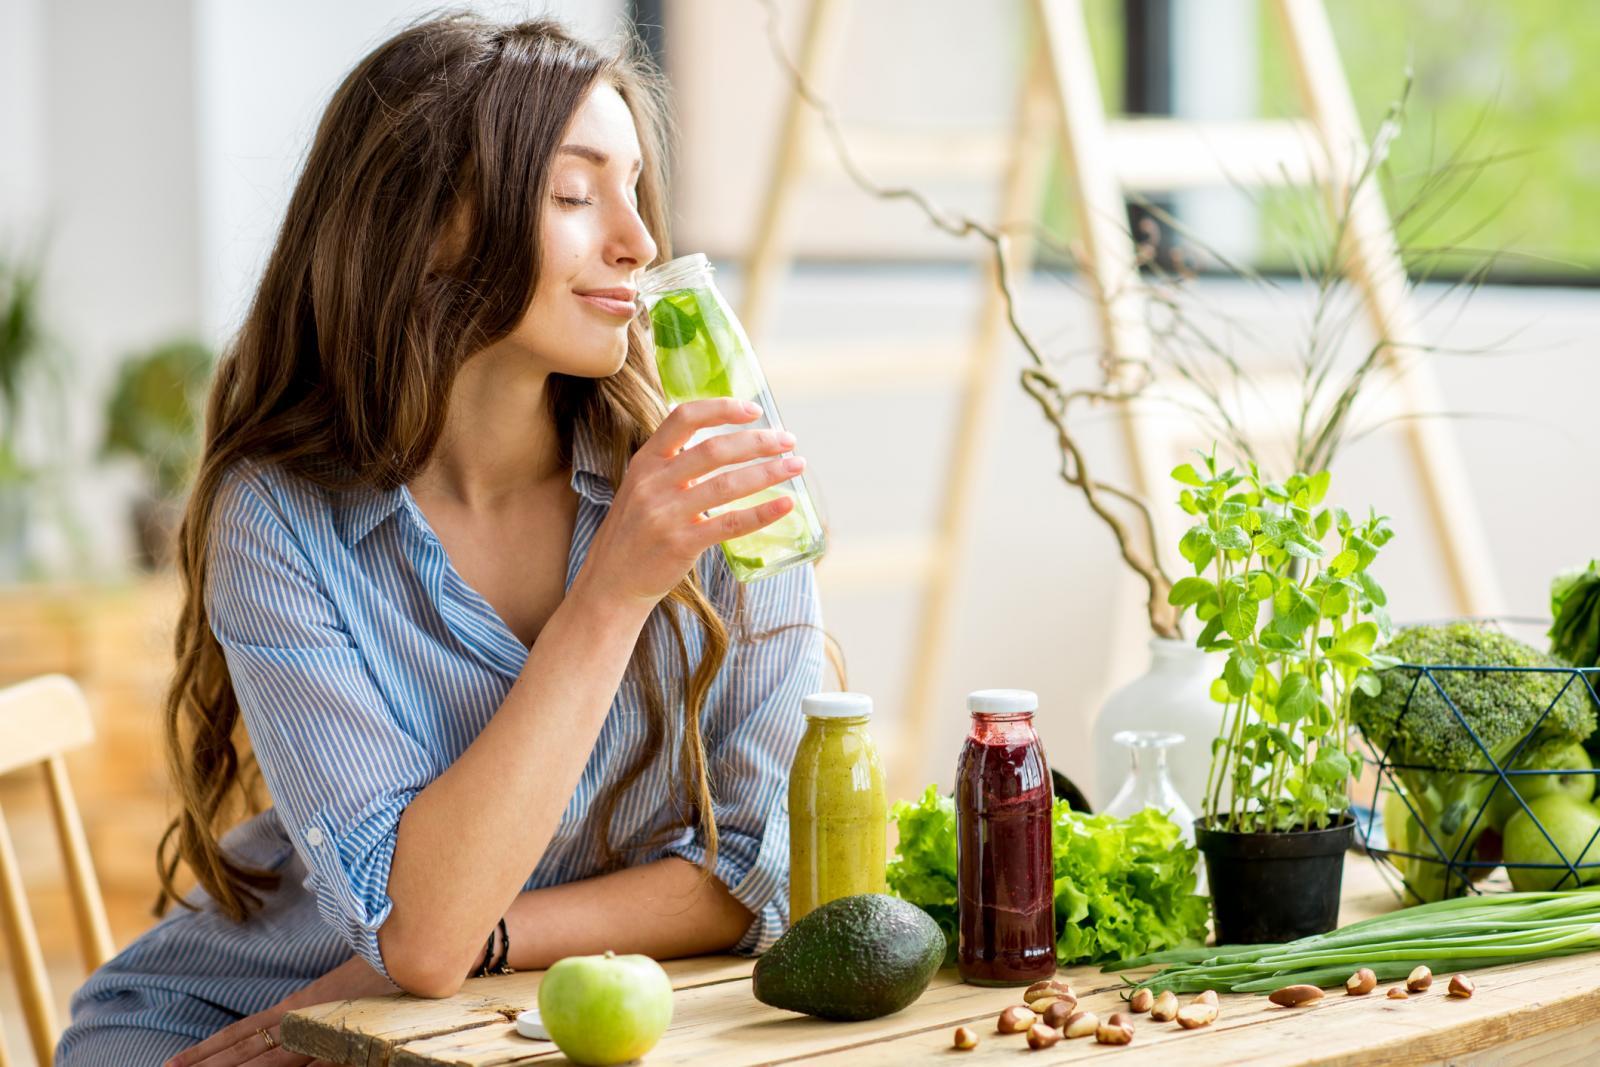 Potrebno je neprestano misliti na svoje zdravlje. Ne samo sada u sezoni detoxa.